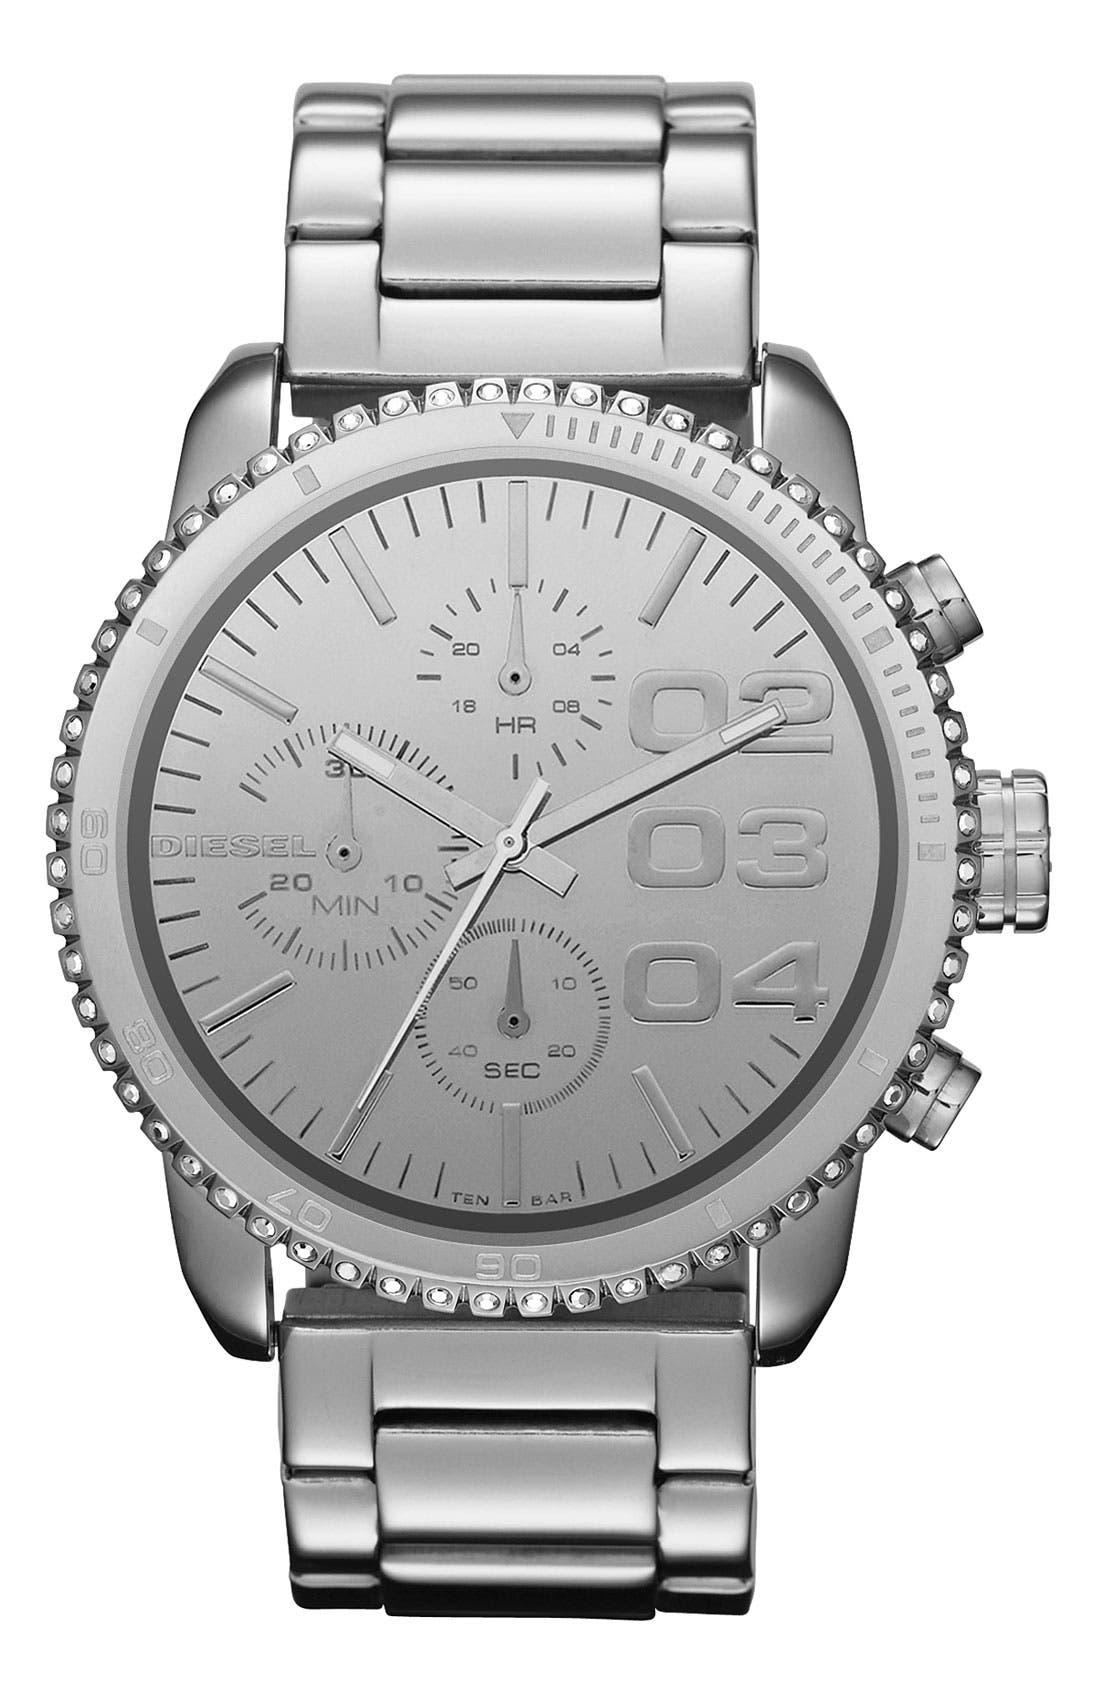 Main Image - DIESEL® 'Franchise' Chronograph Bracelet Watch, 42mm x 46mm